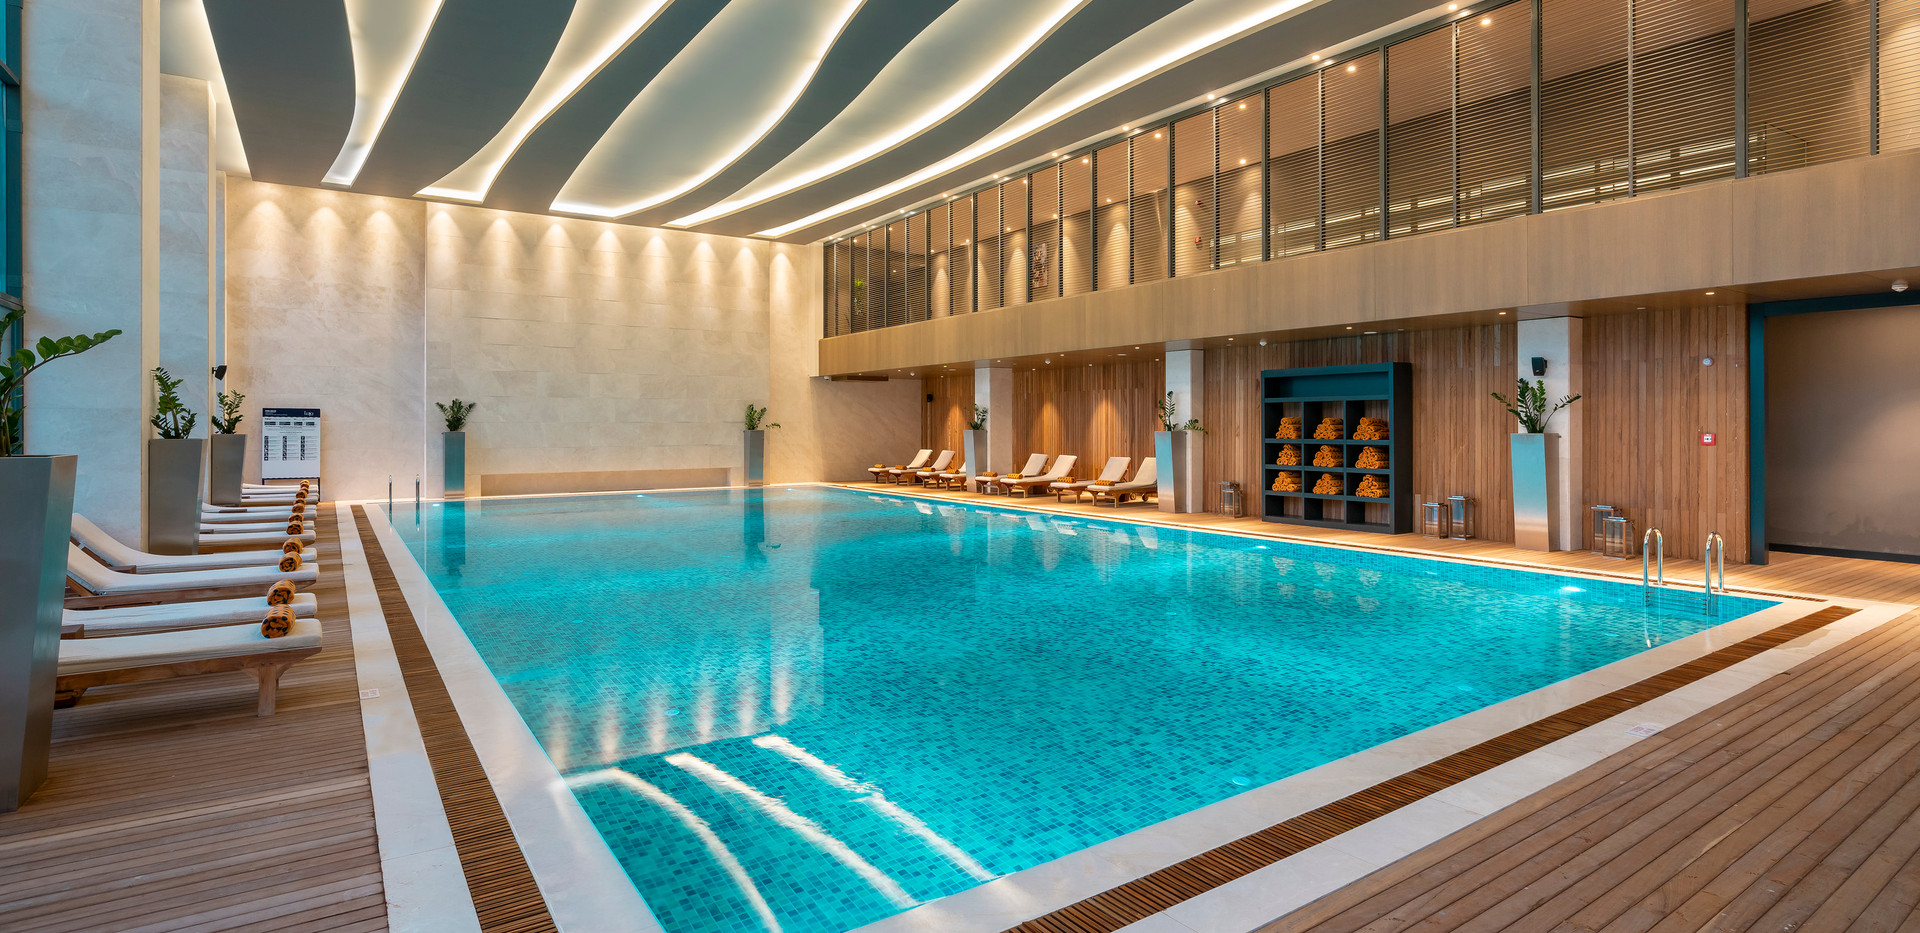 Indoor Pool - 02.jpg